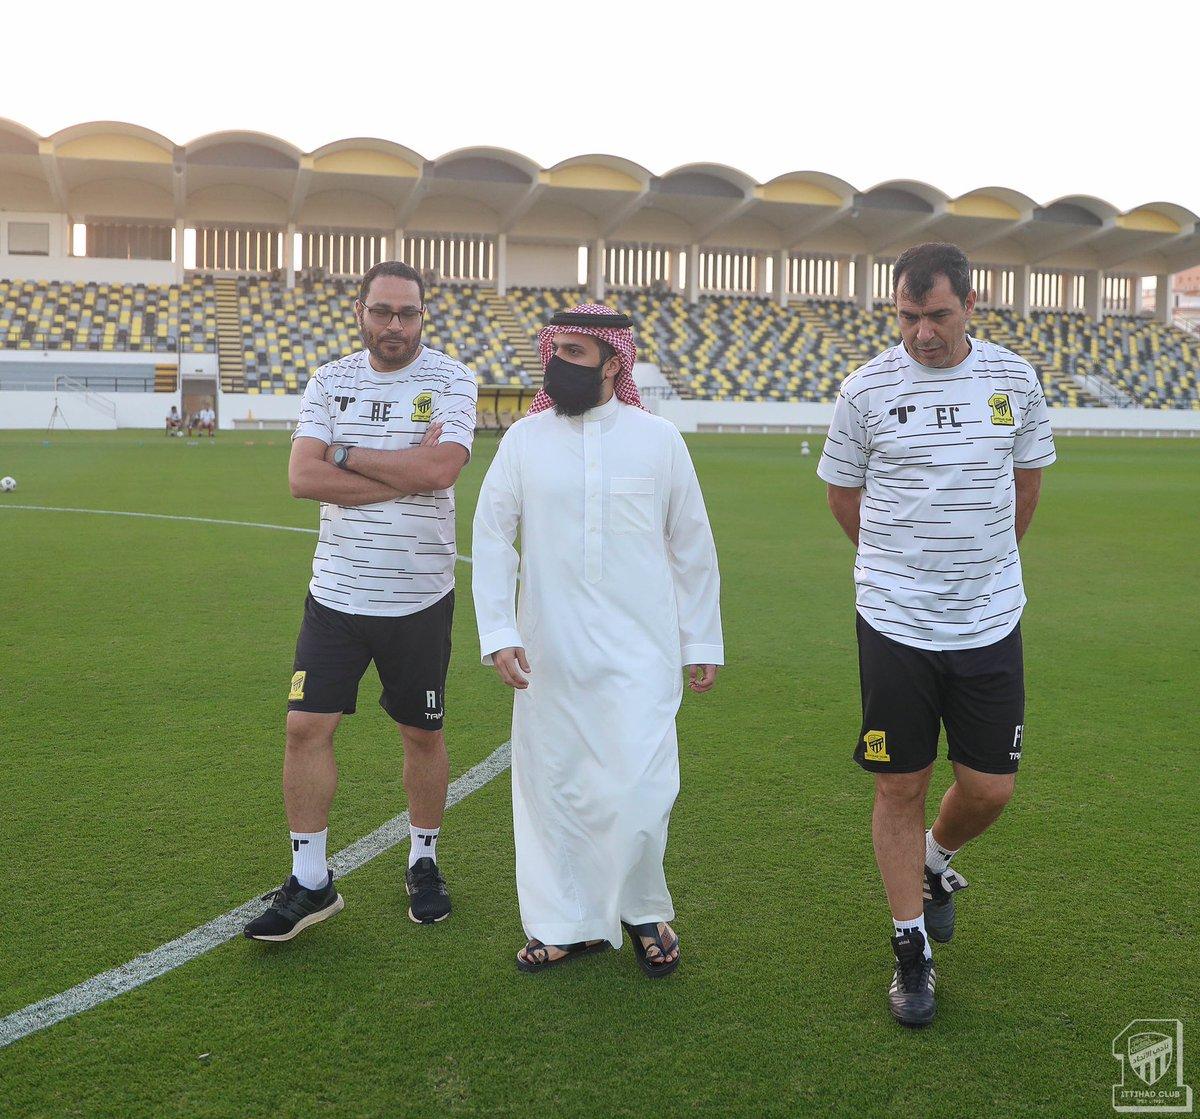 Download نادي الاتحاد السعودي On Twitter التقرير الطبي للاعب برونو هن